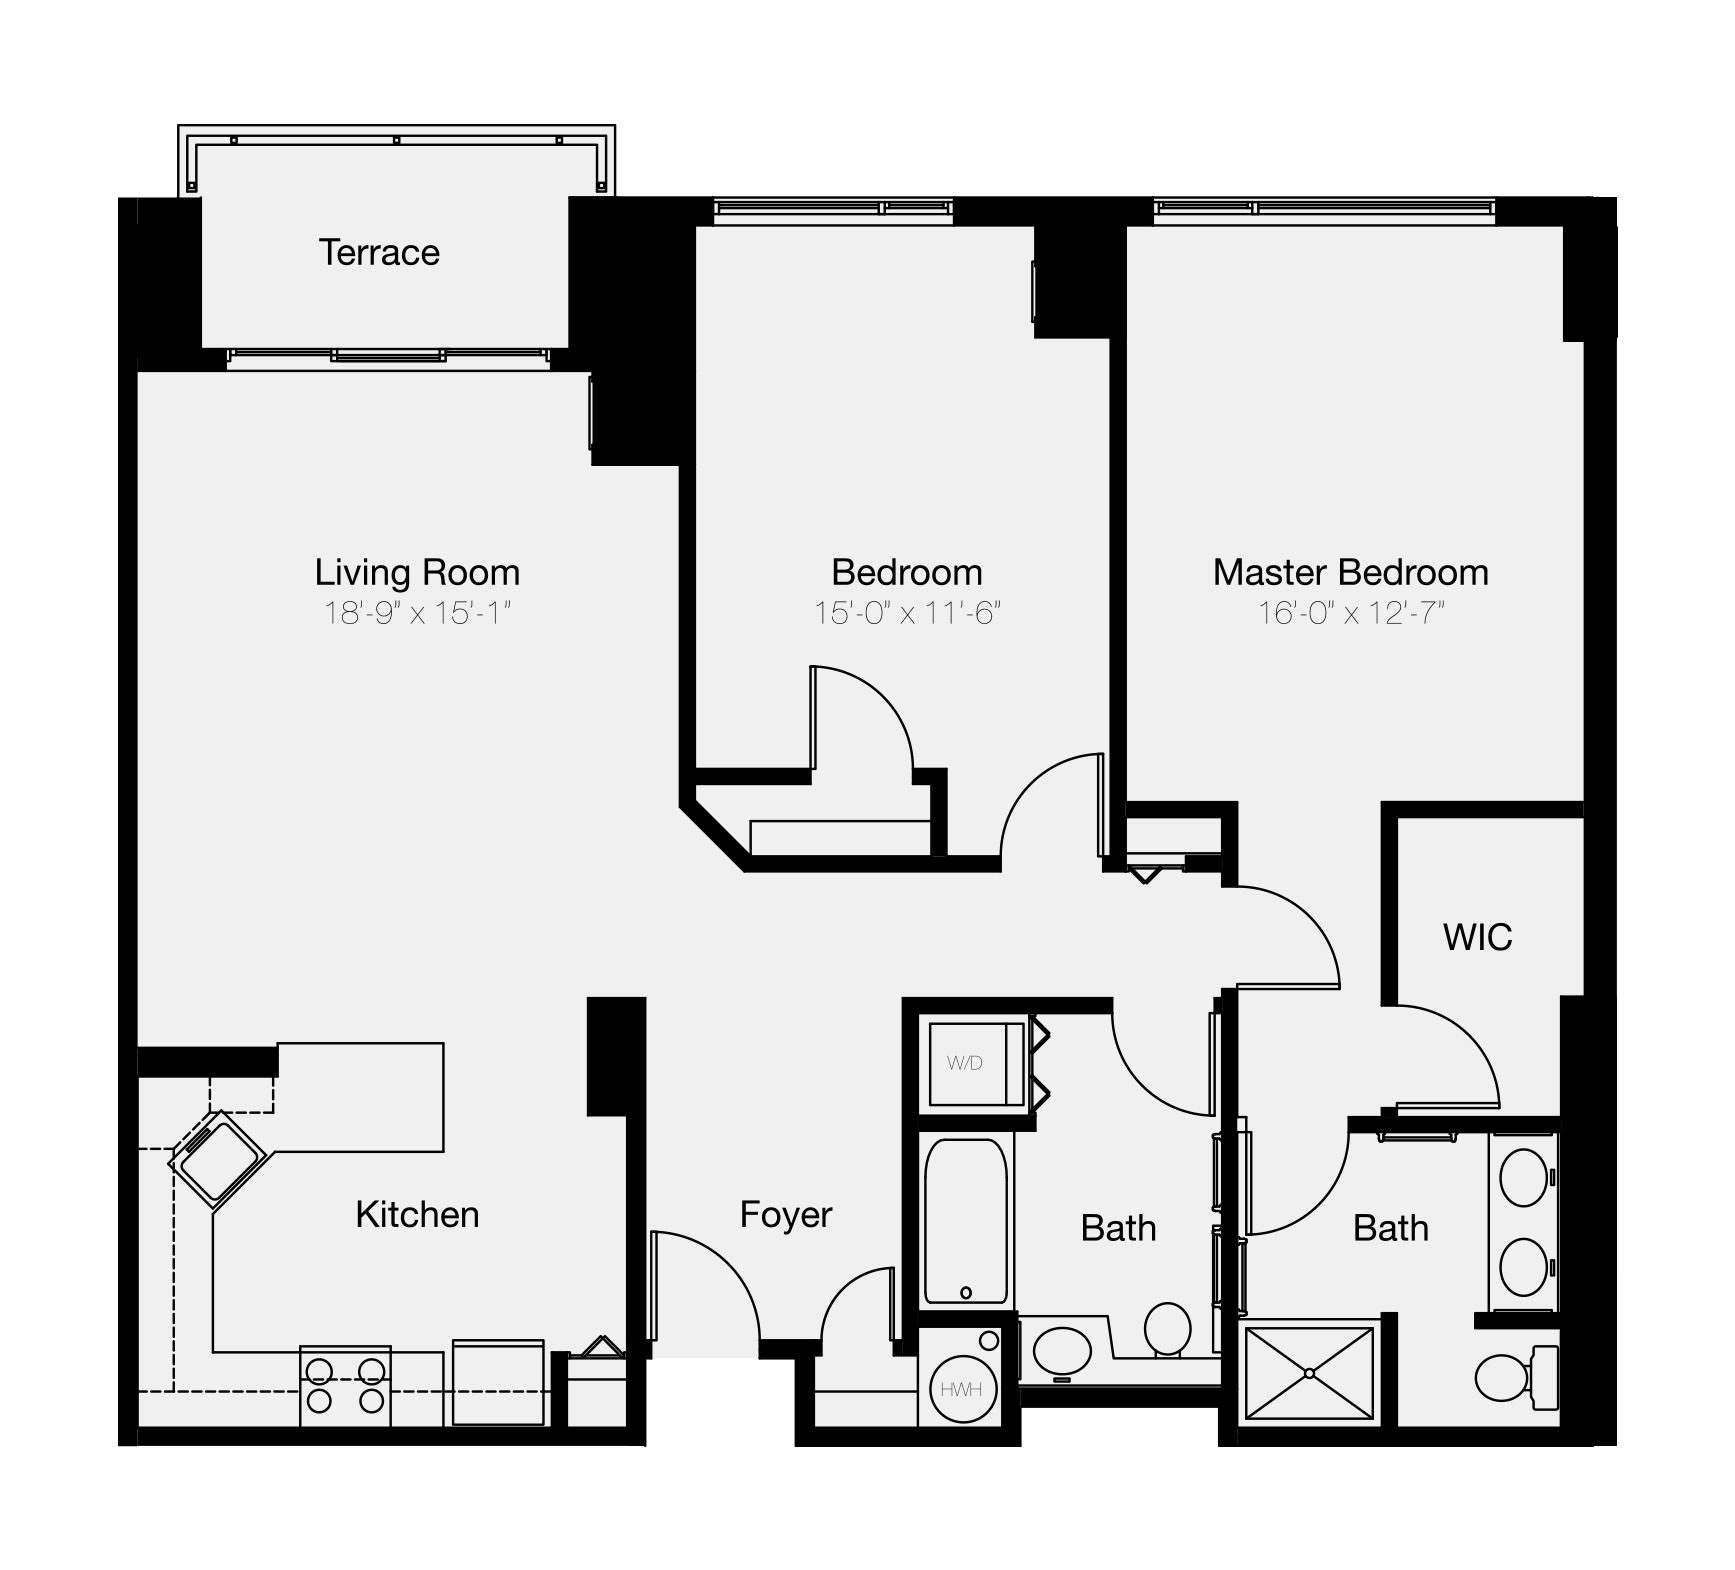 Two-bedroom floor plan of luxury Philadelphia condo for sale